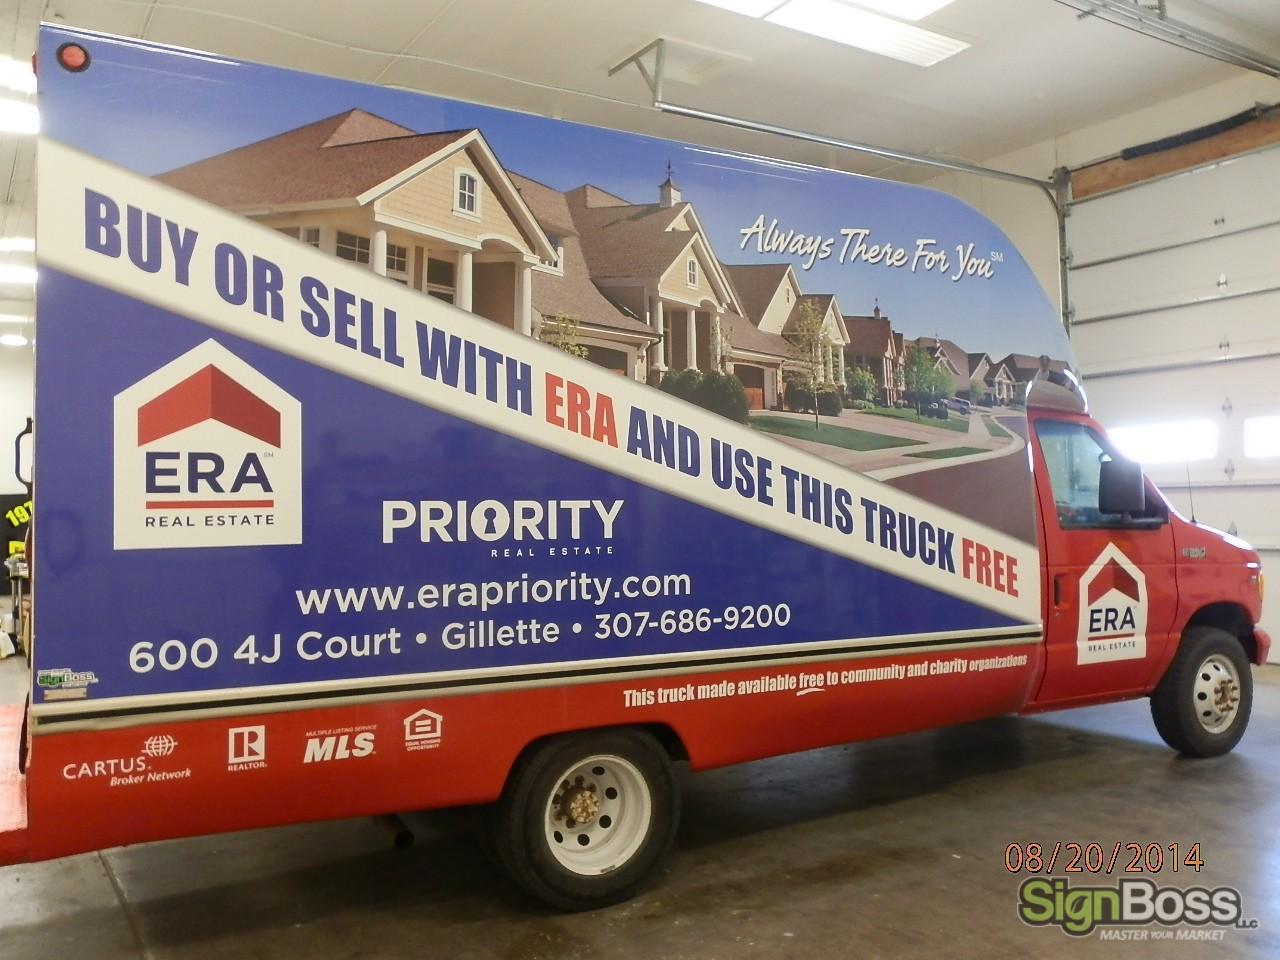 Car Real Estate: WRAPS & GRAPHICS